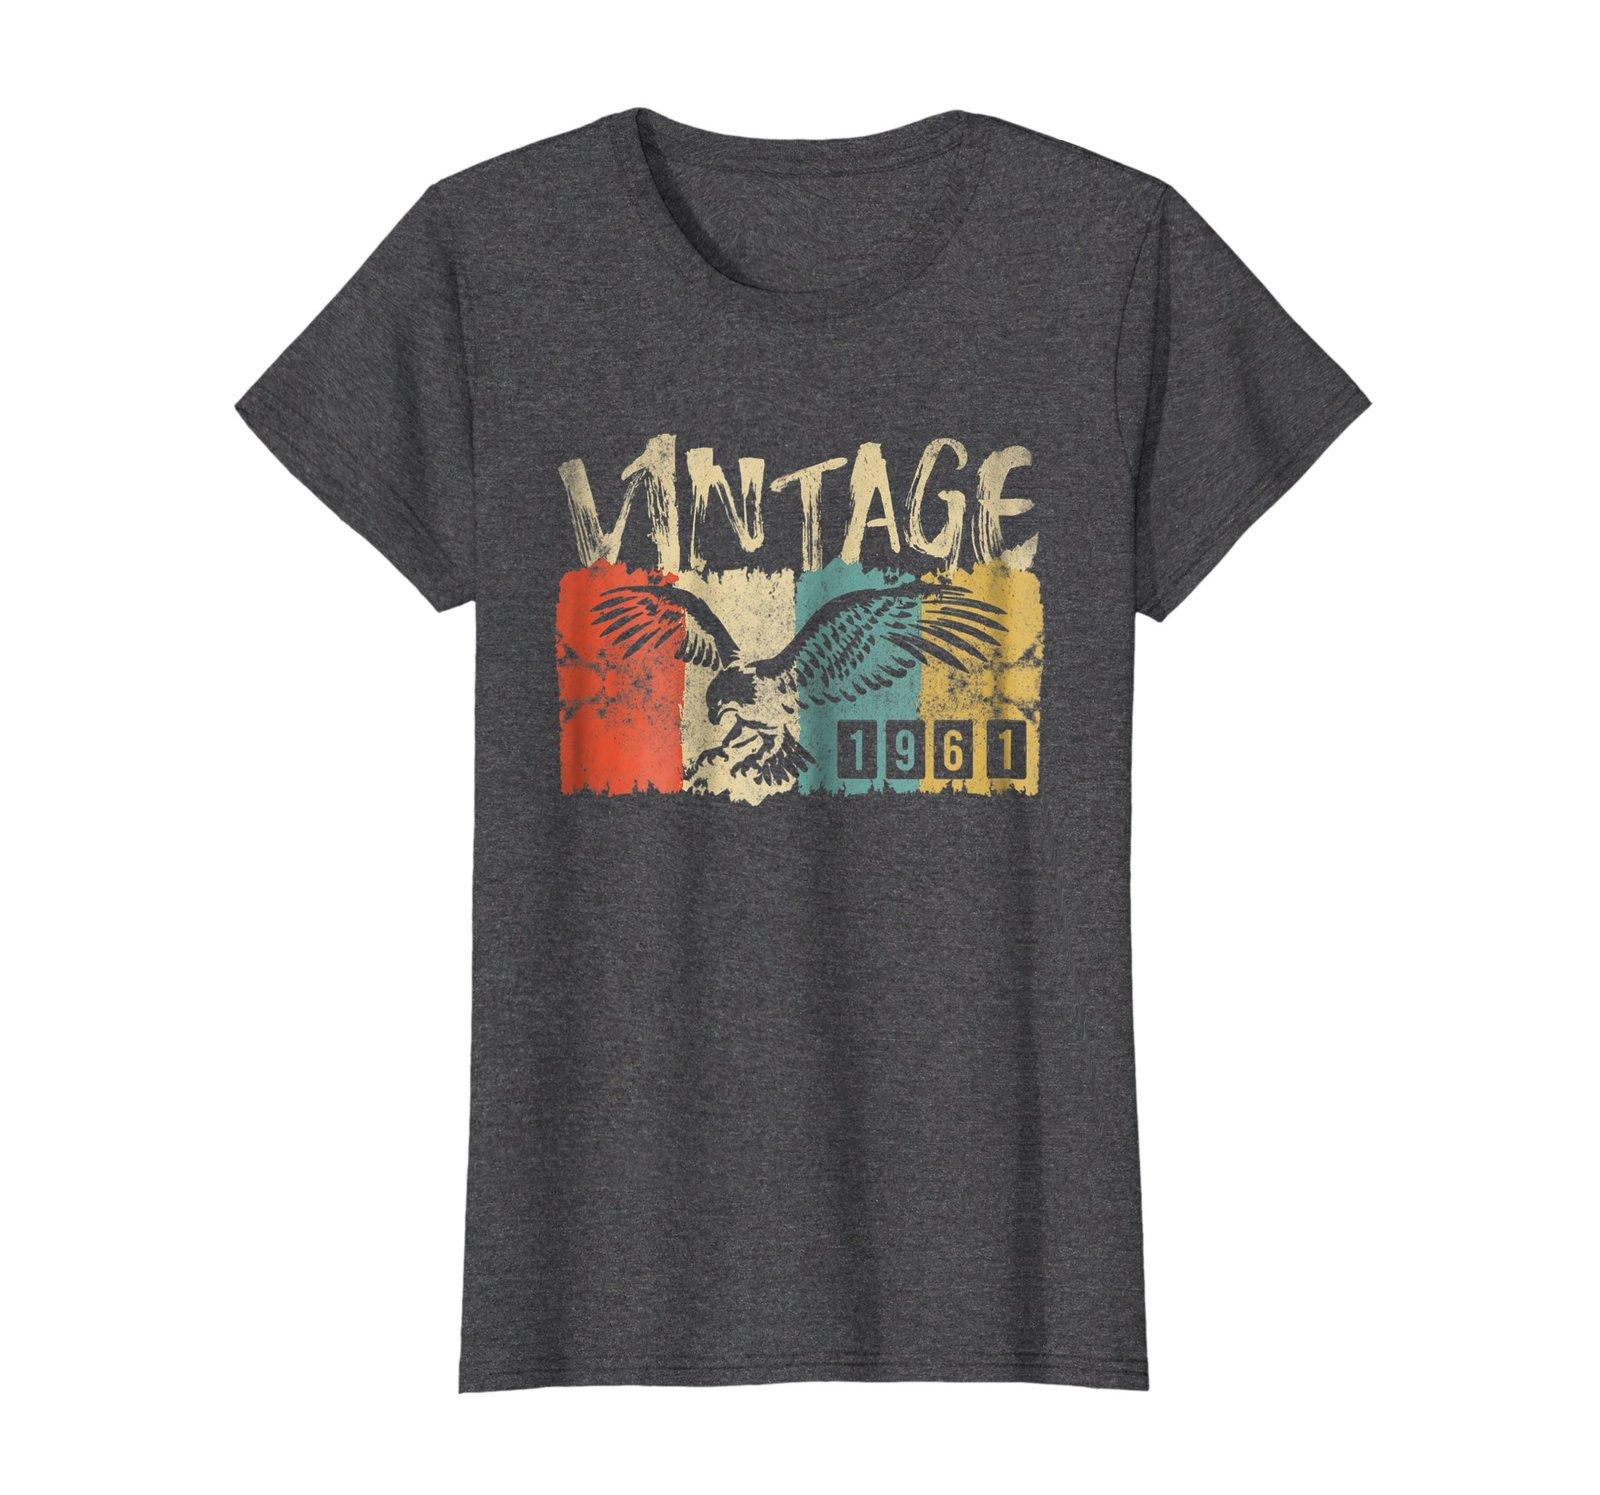 Funny Shirts - Vintage Retro Genuine Made In 1961 57th Birthday Gift 57 yrs Wowe